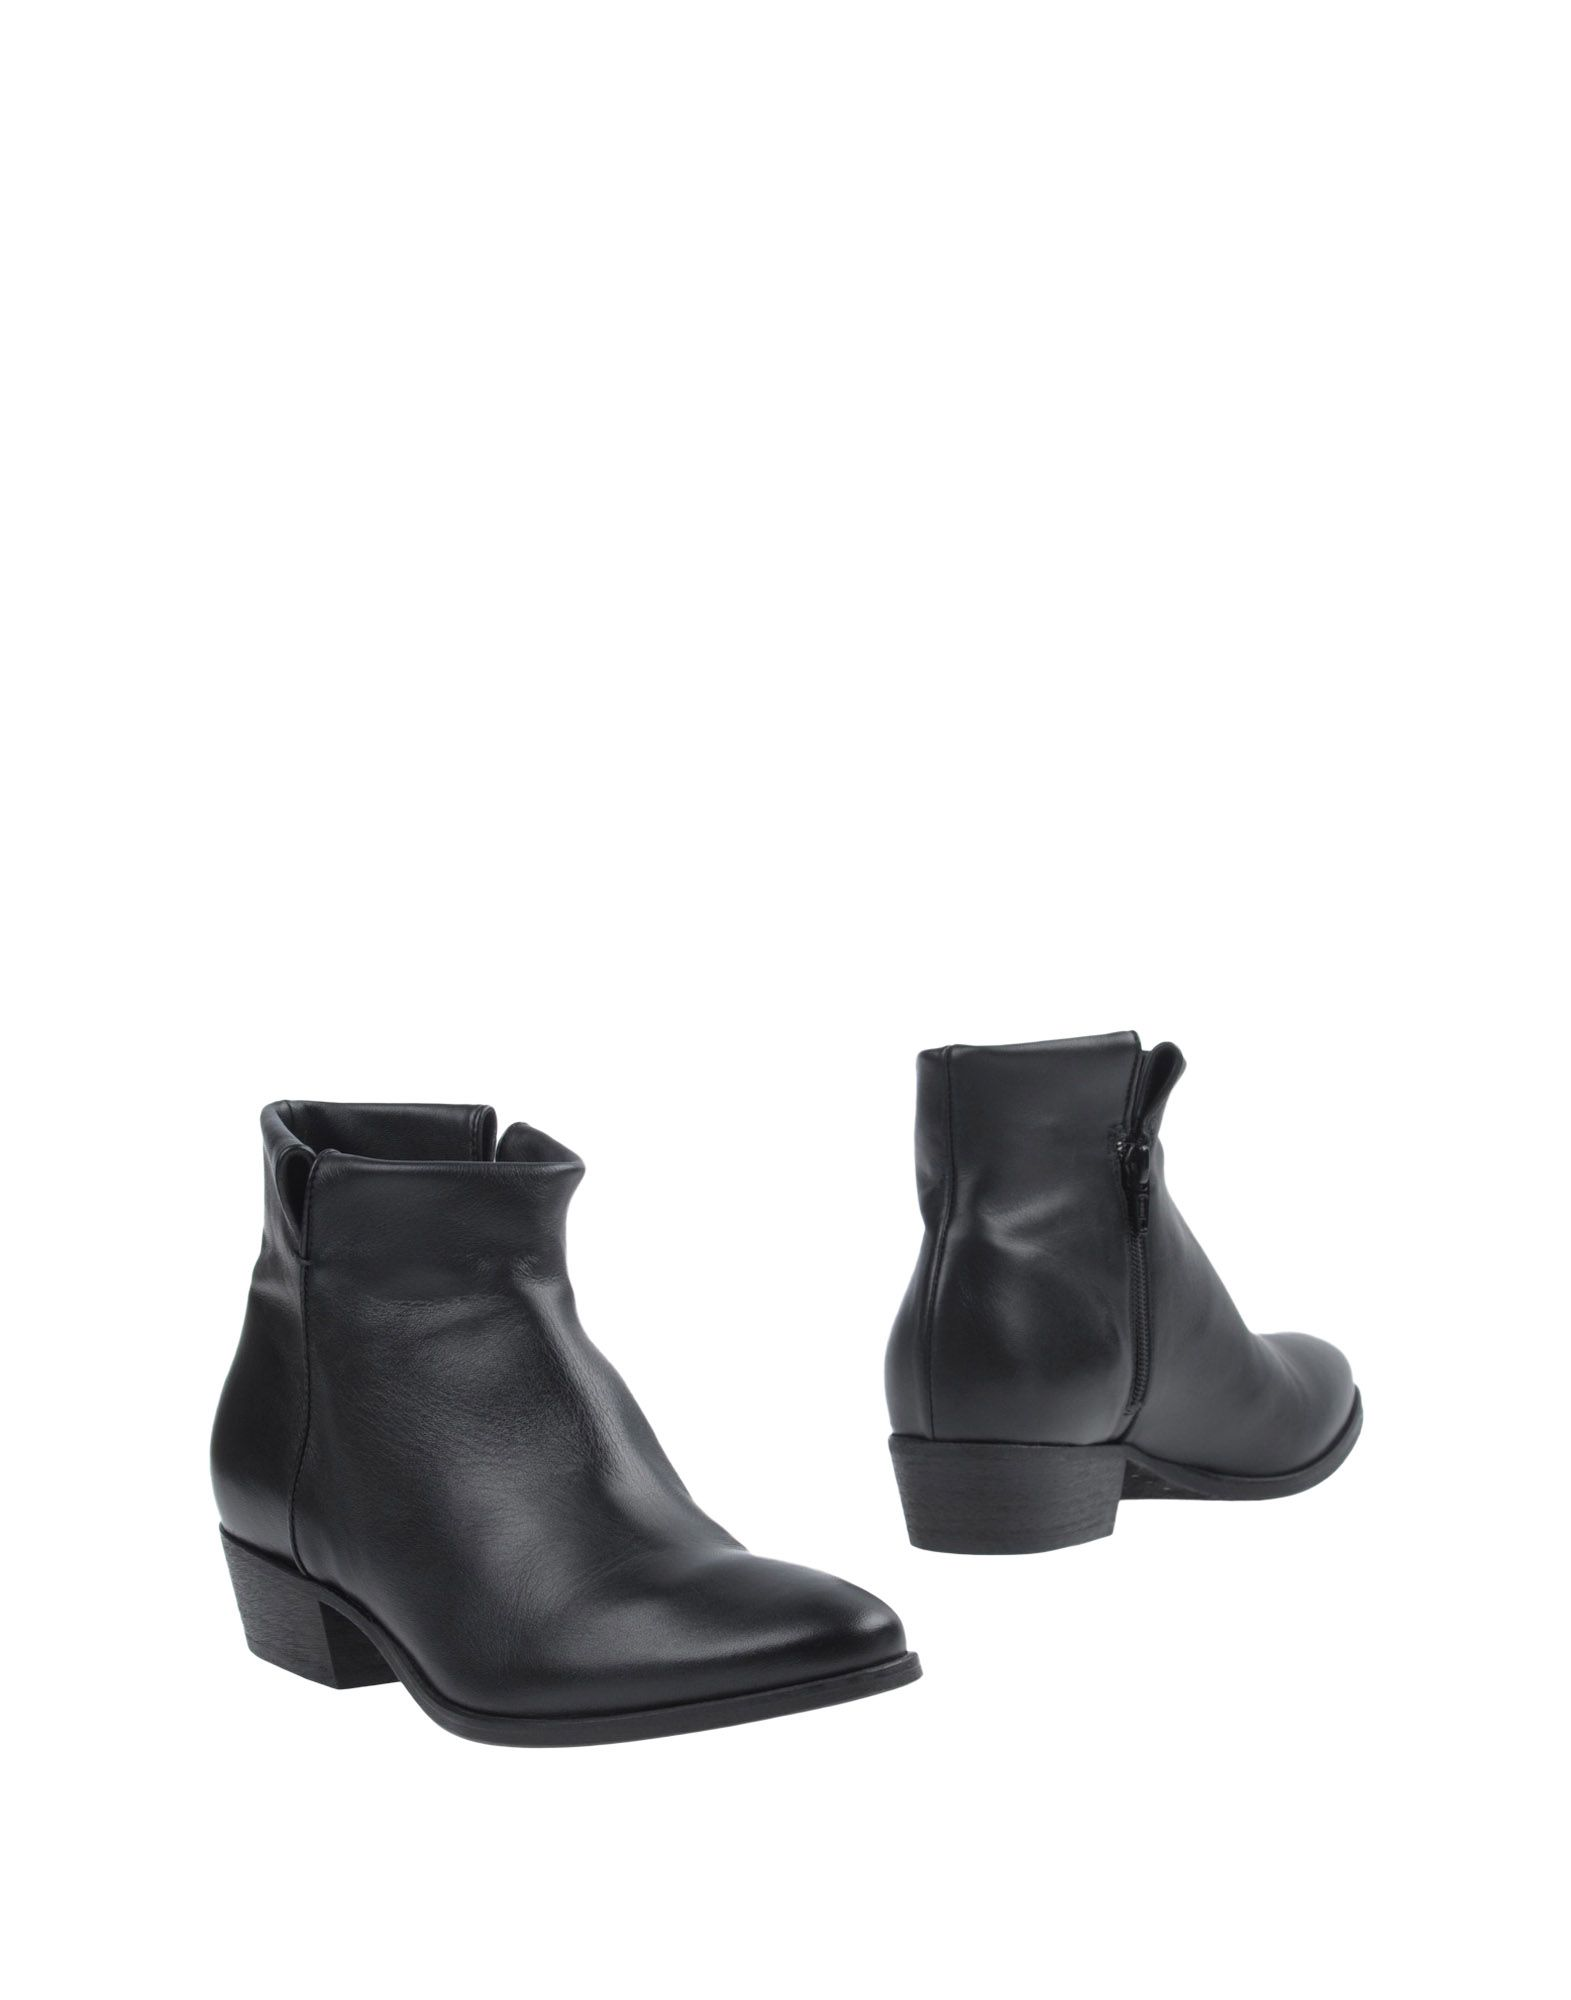 Stilvolle billige Schuhe Strategia Stiefelette Damen Damen Damen  11382009NF 3fb4ff